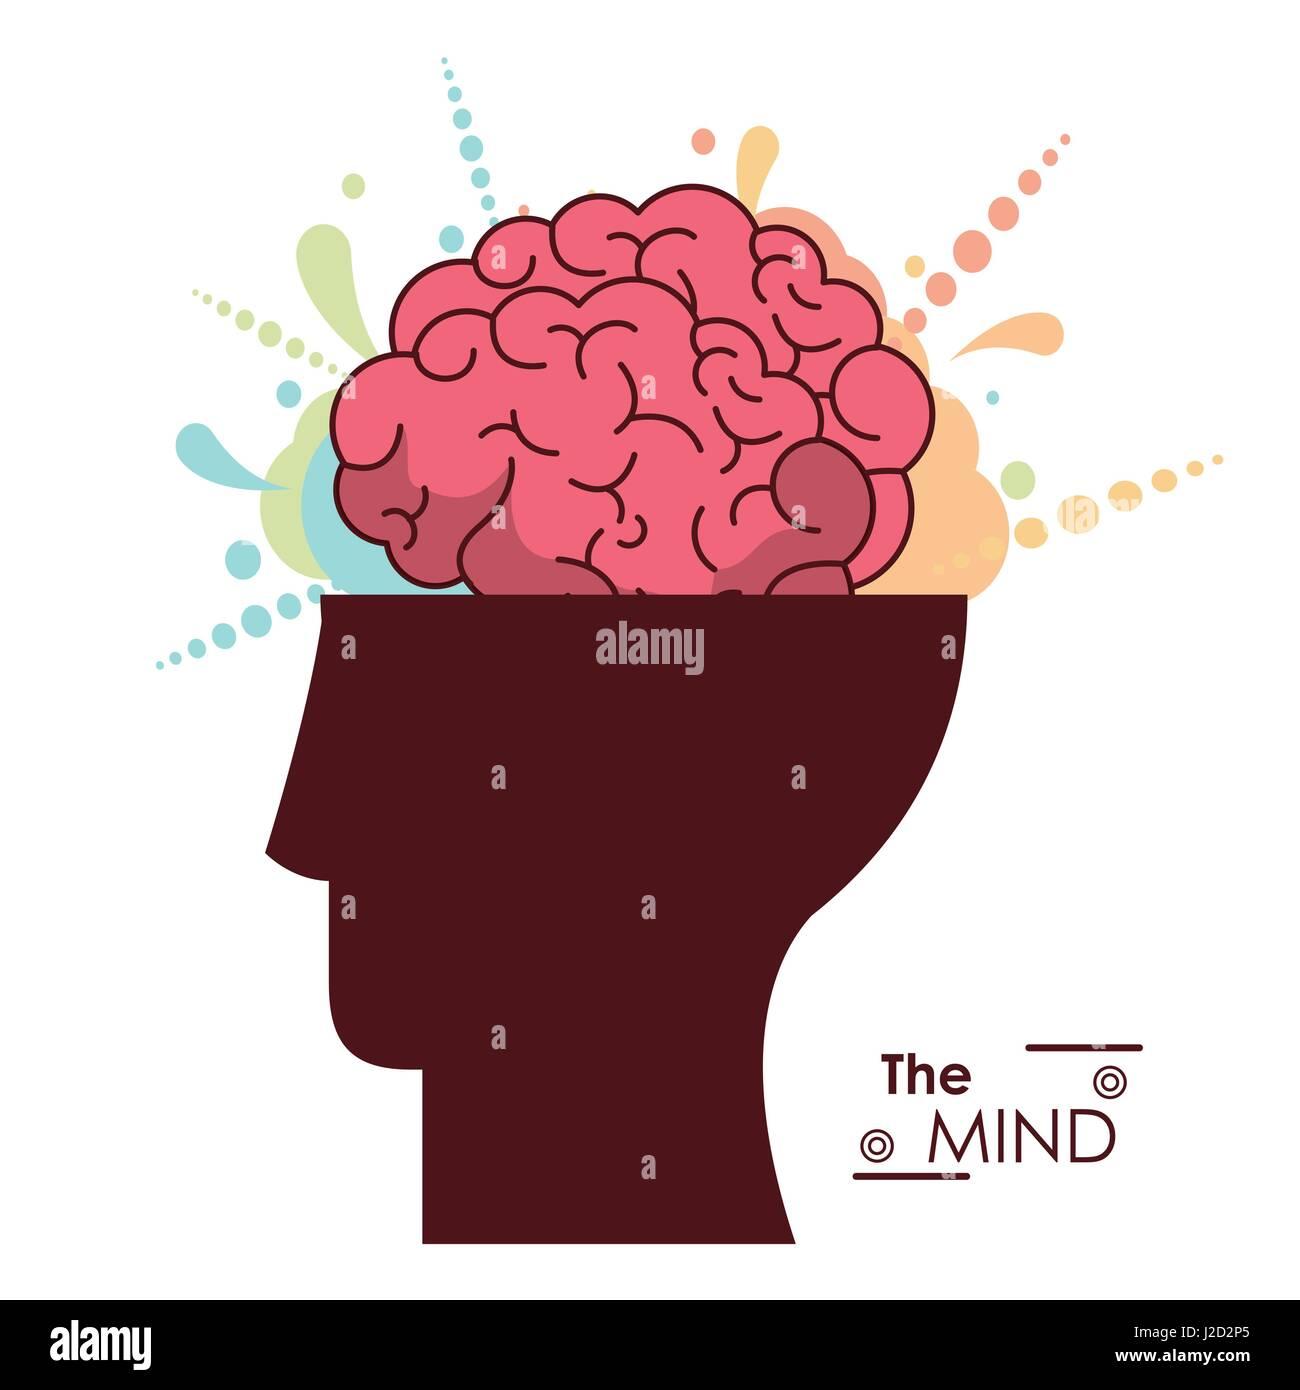 the mind human head brain creativity memory - Stock Image